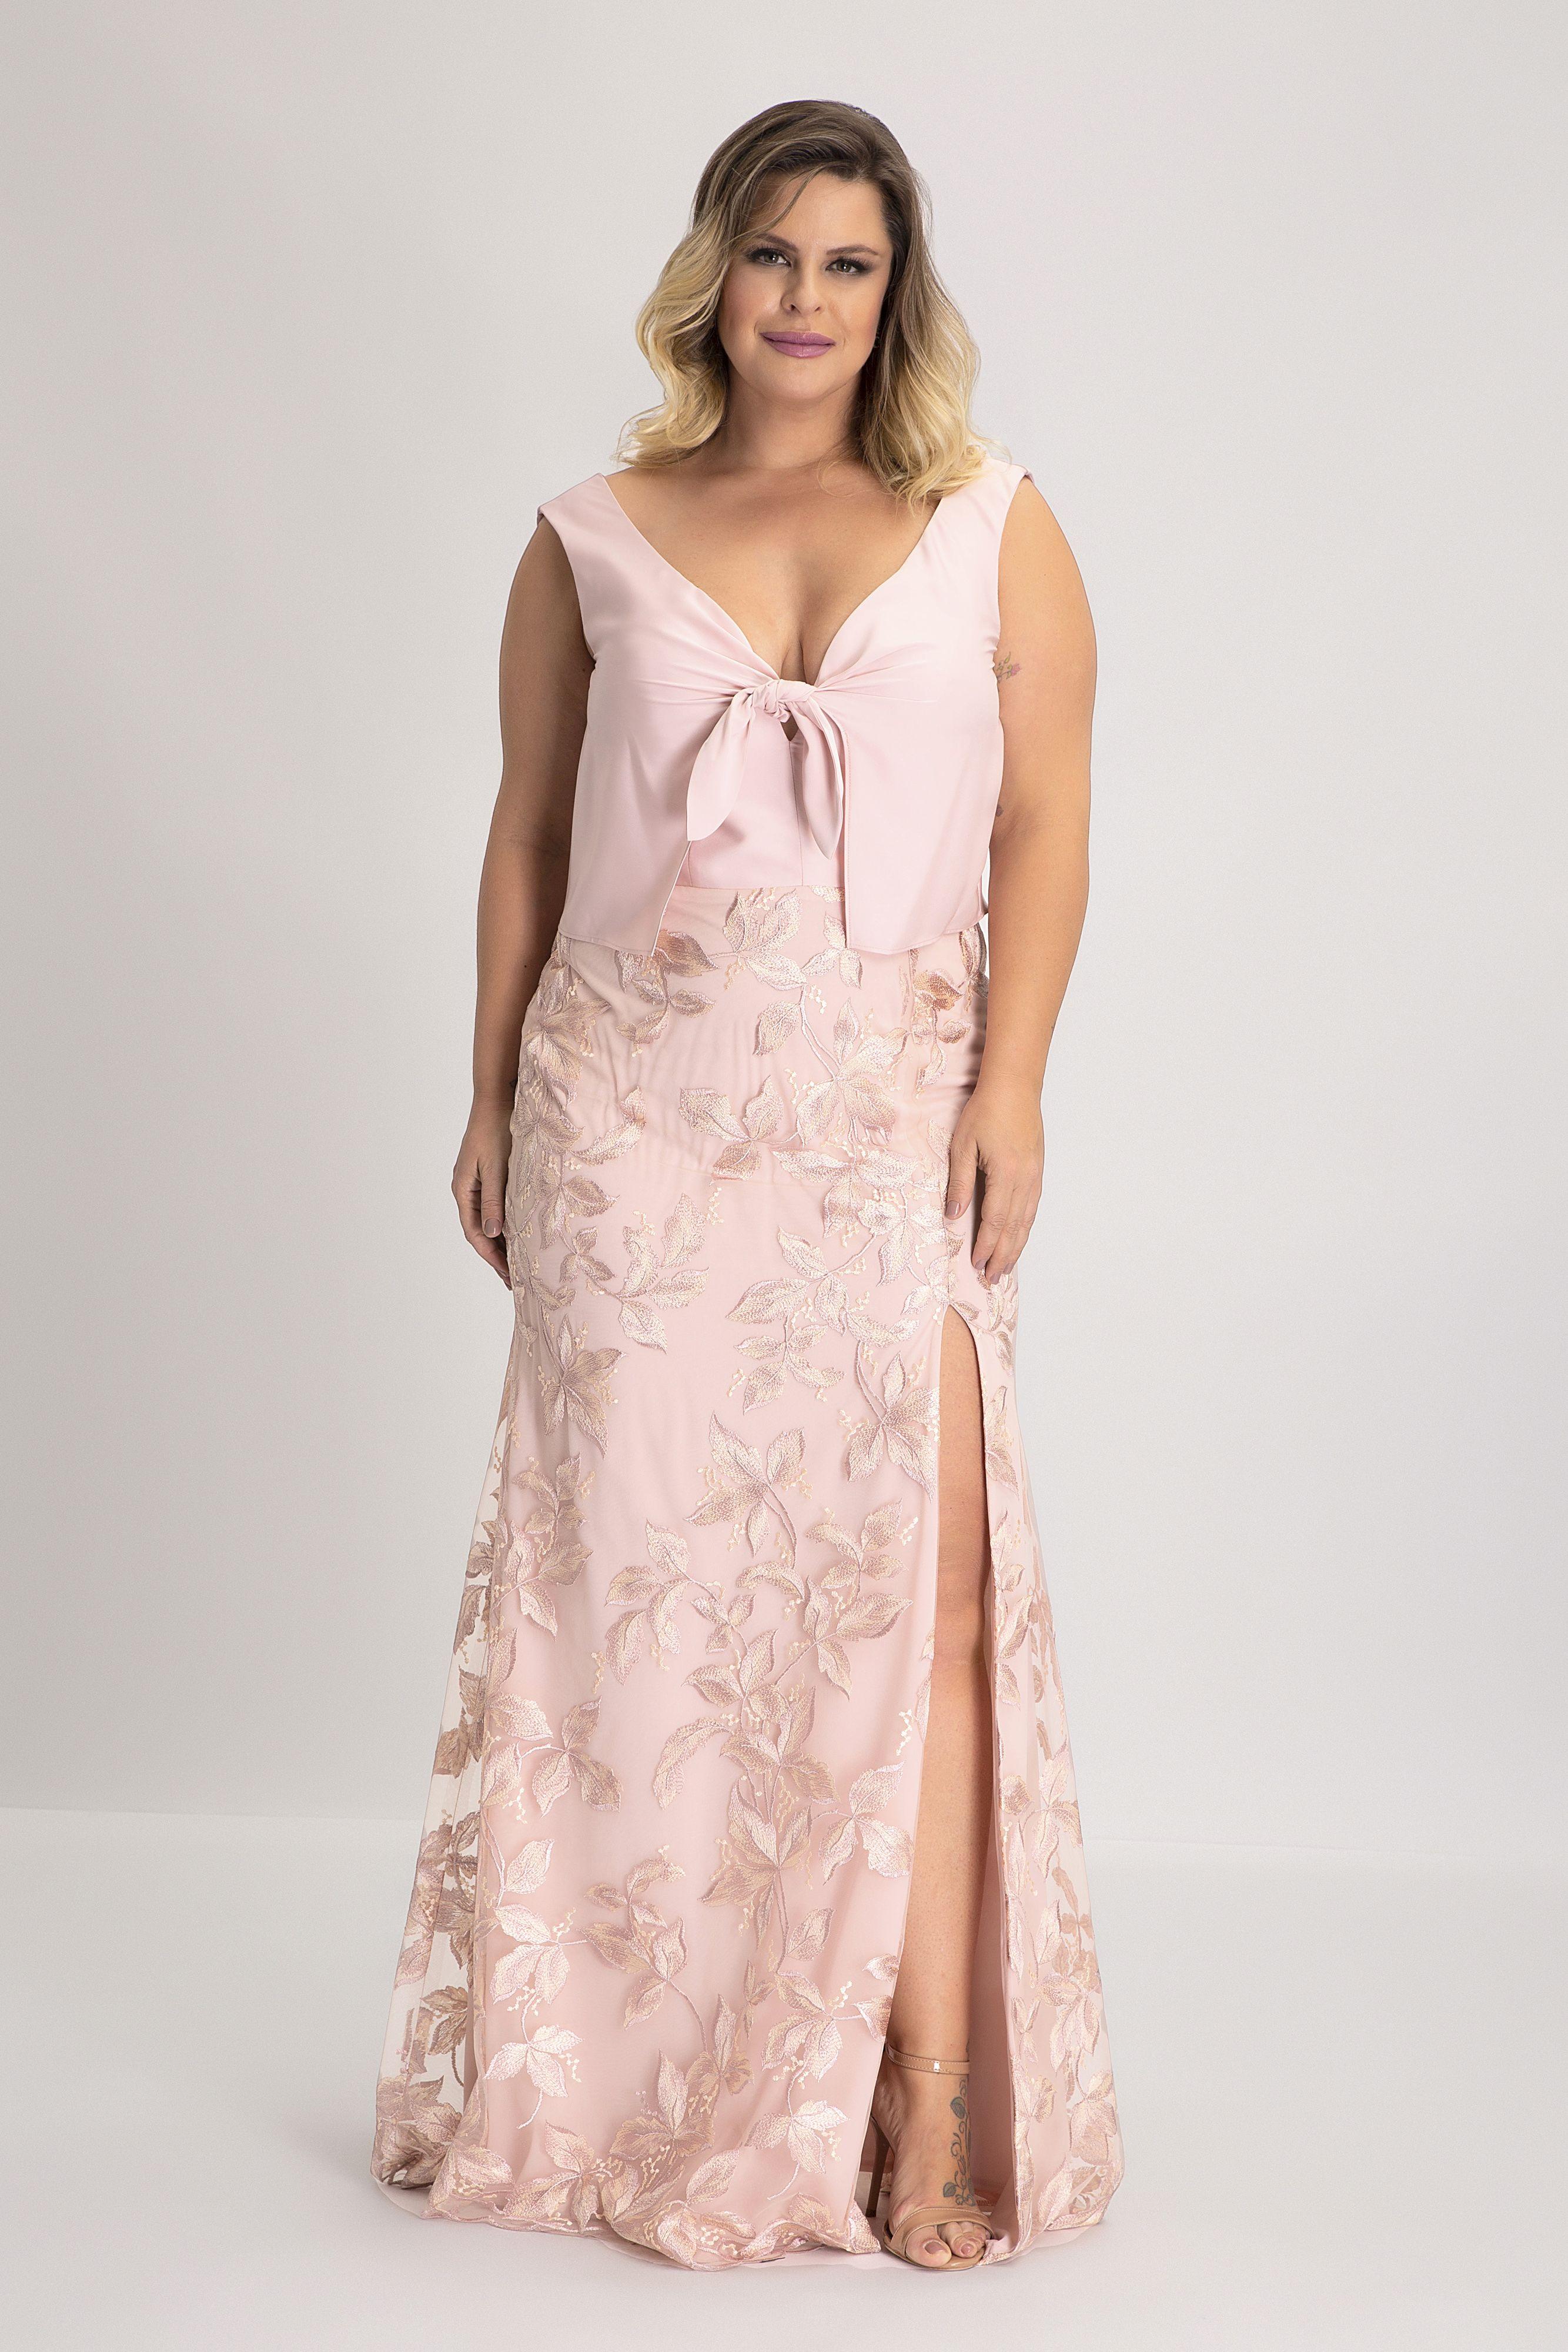 d82ebbf94 Vestido Nó Vetu: Vestido longo de crepe acetinado com tule bordado super  rico na saia